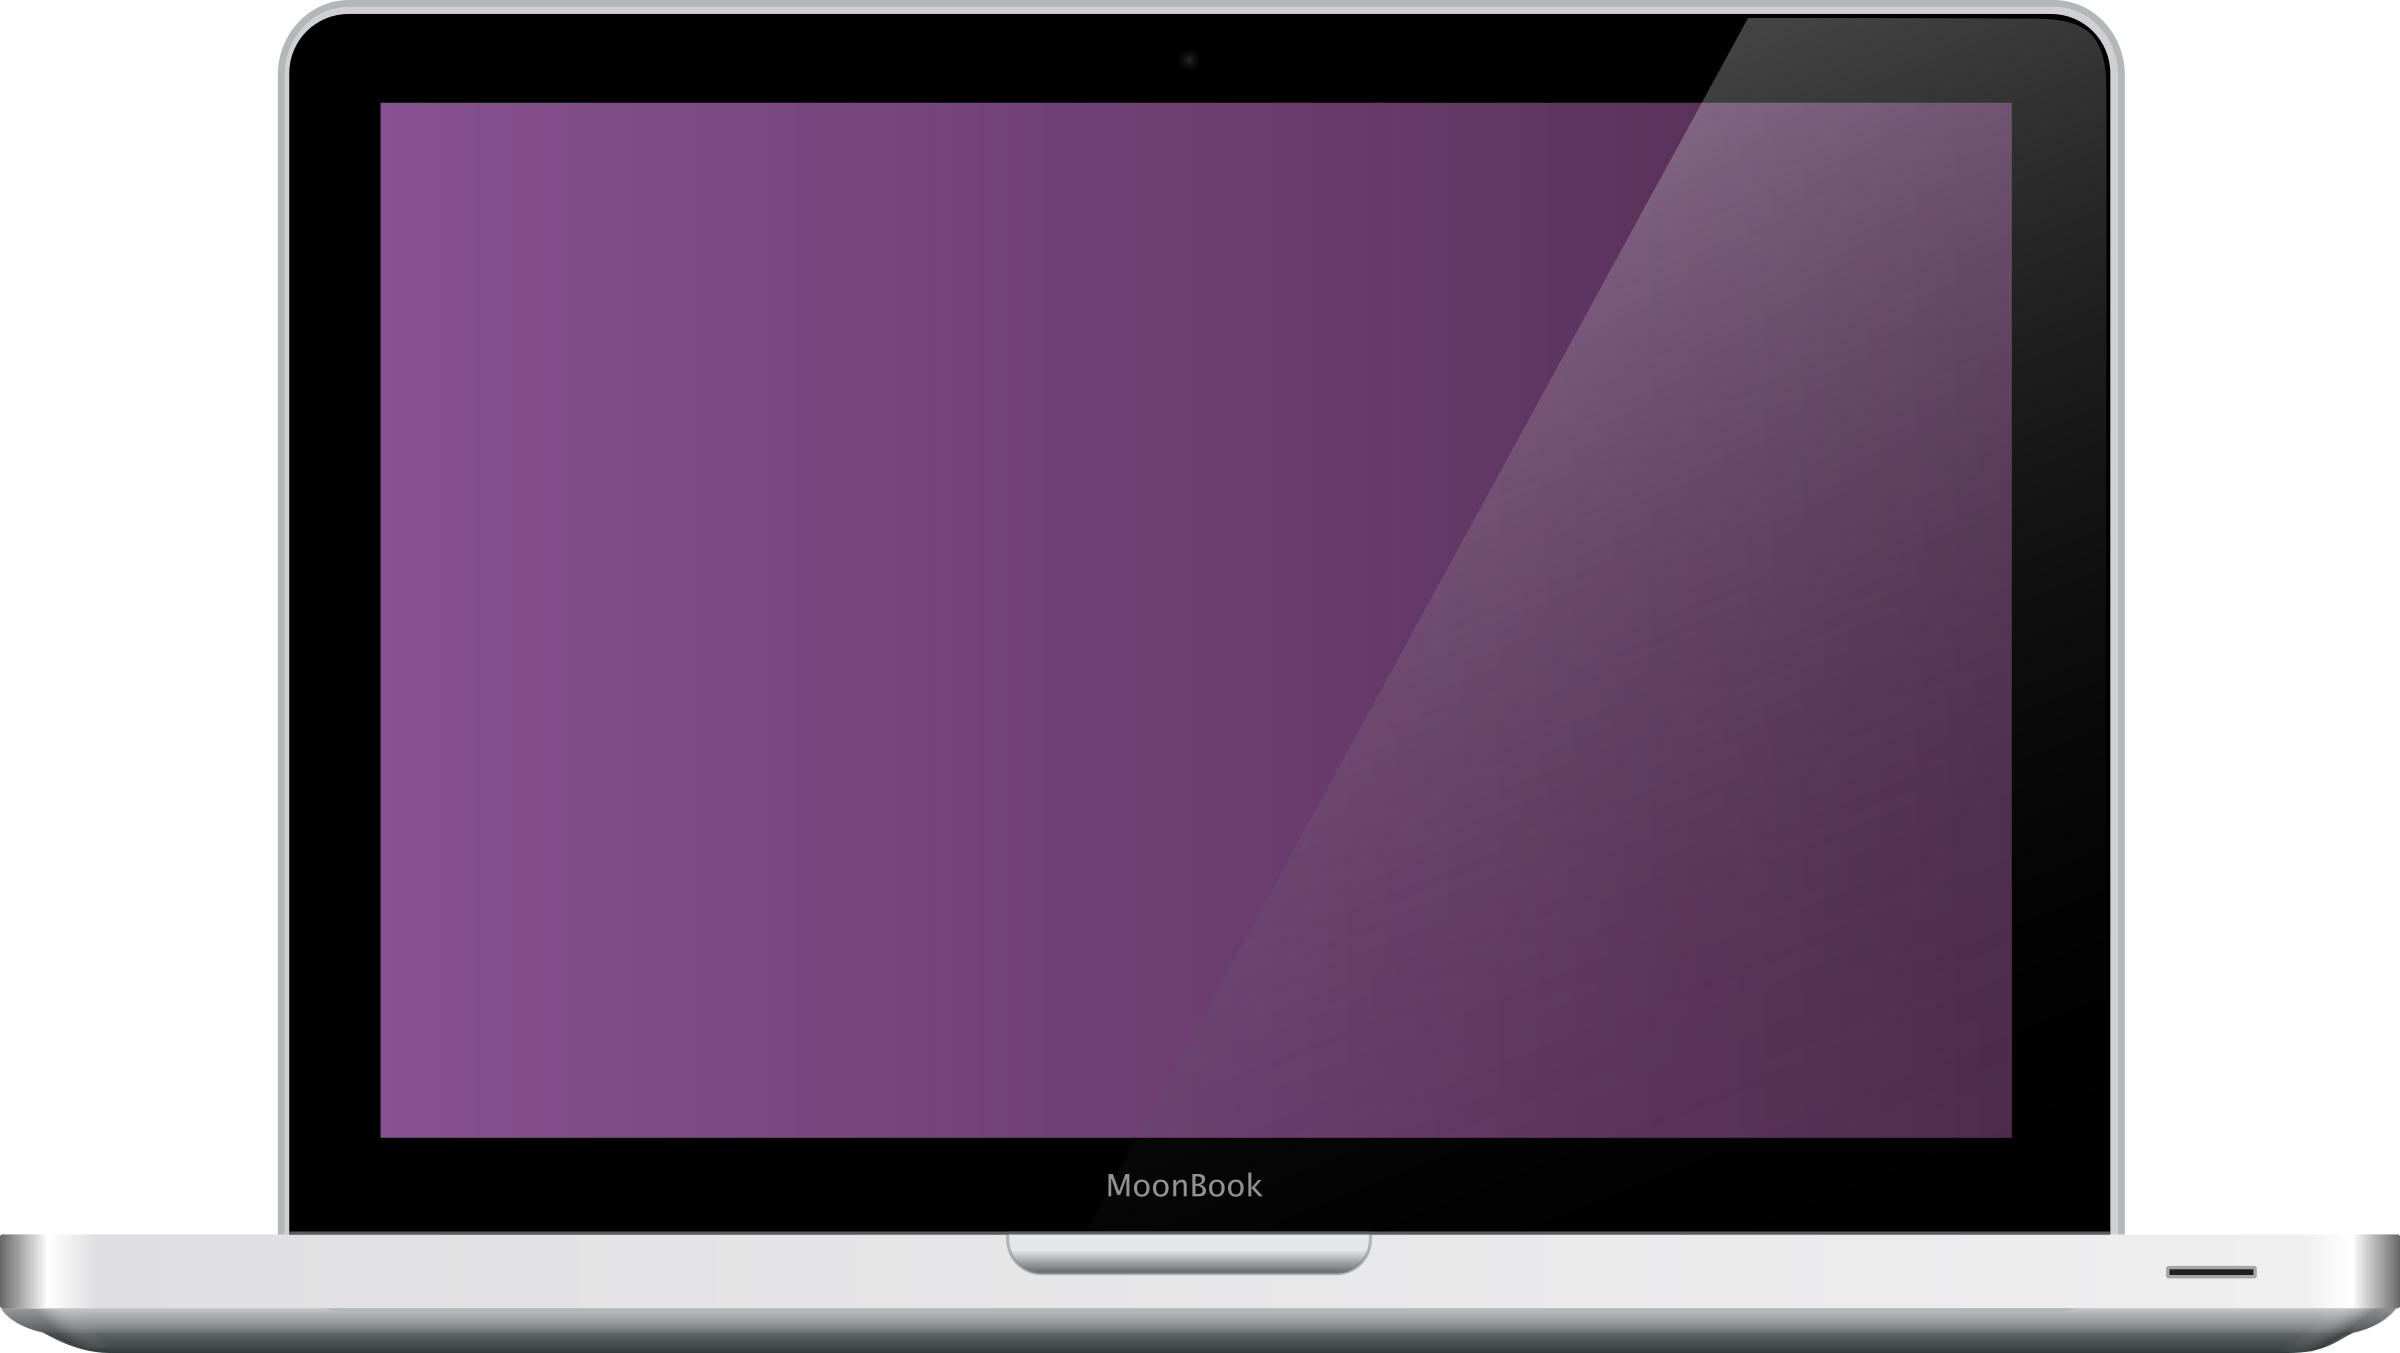 Display clipart laptop screen Clipart MoonBook Laptop MoonBook Laptop